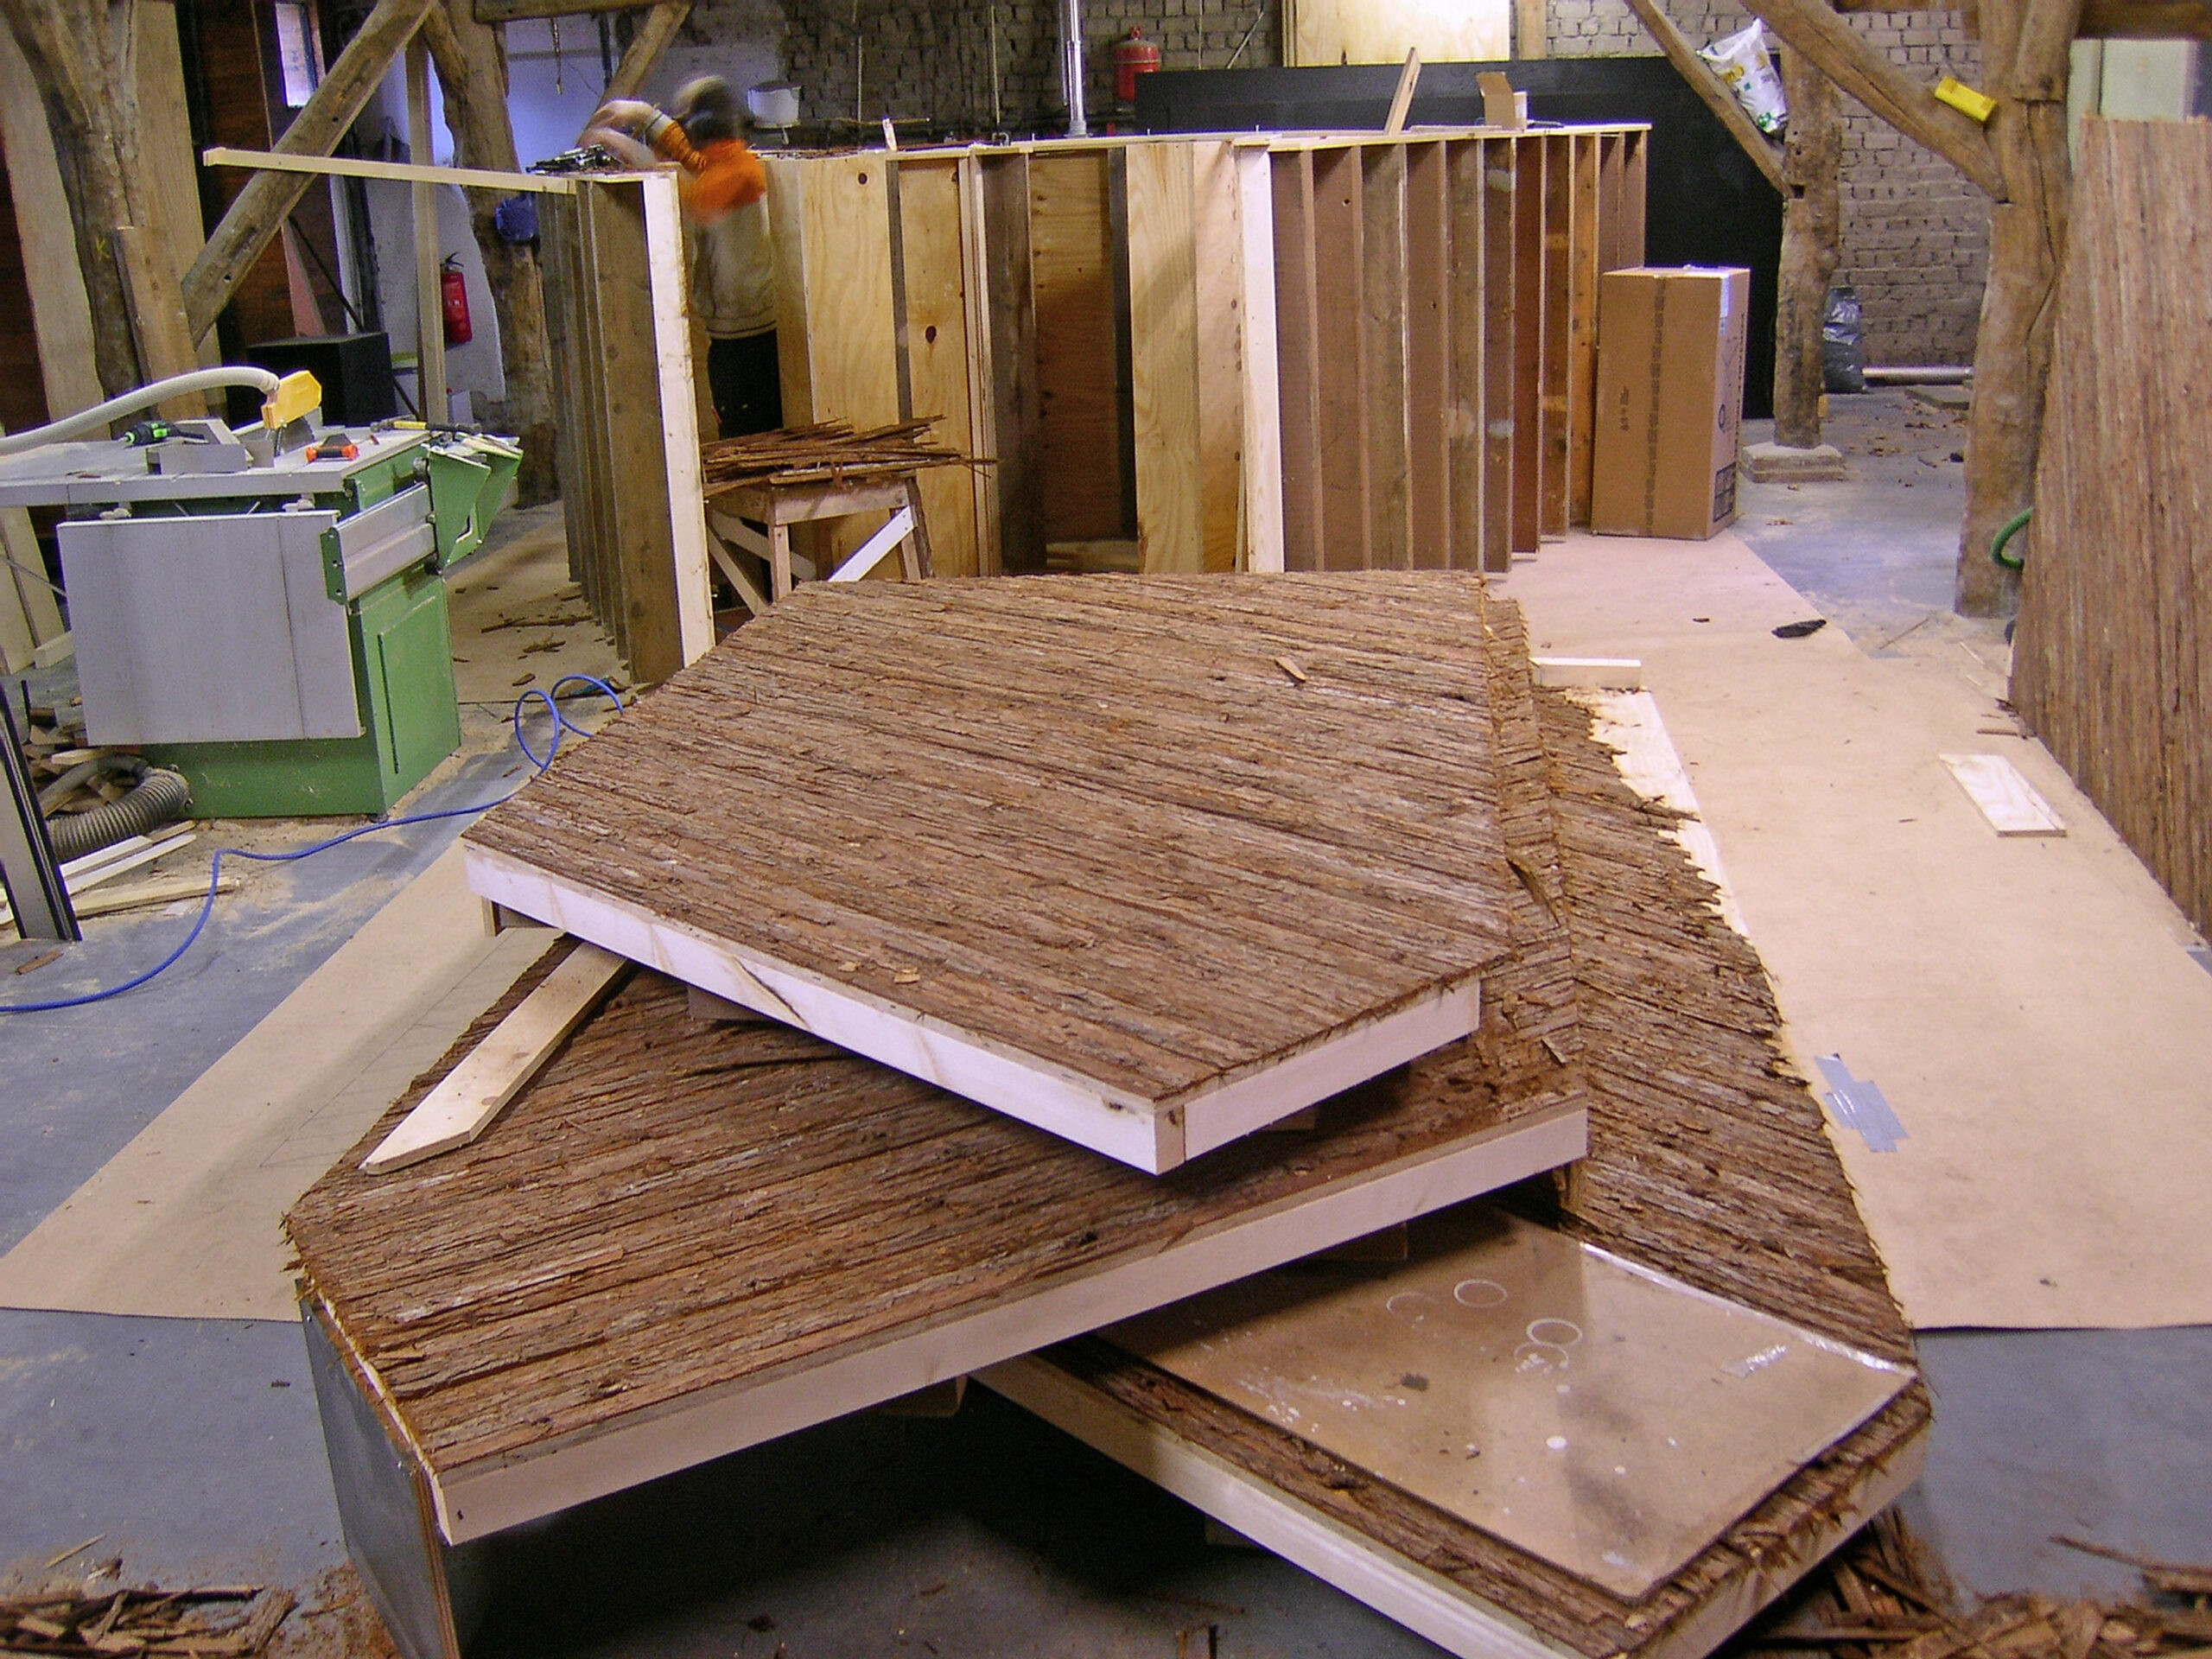 Studio Frank Havermans casting parts with tree bark, 2008